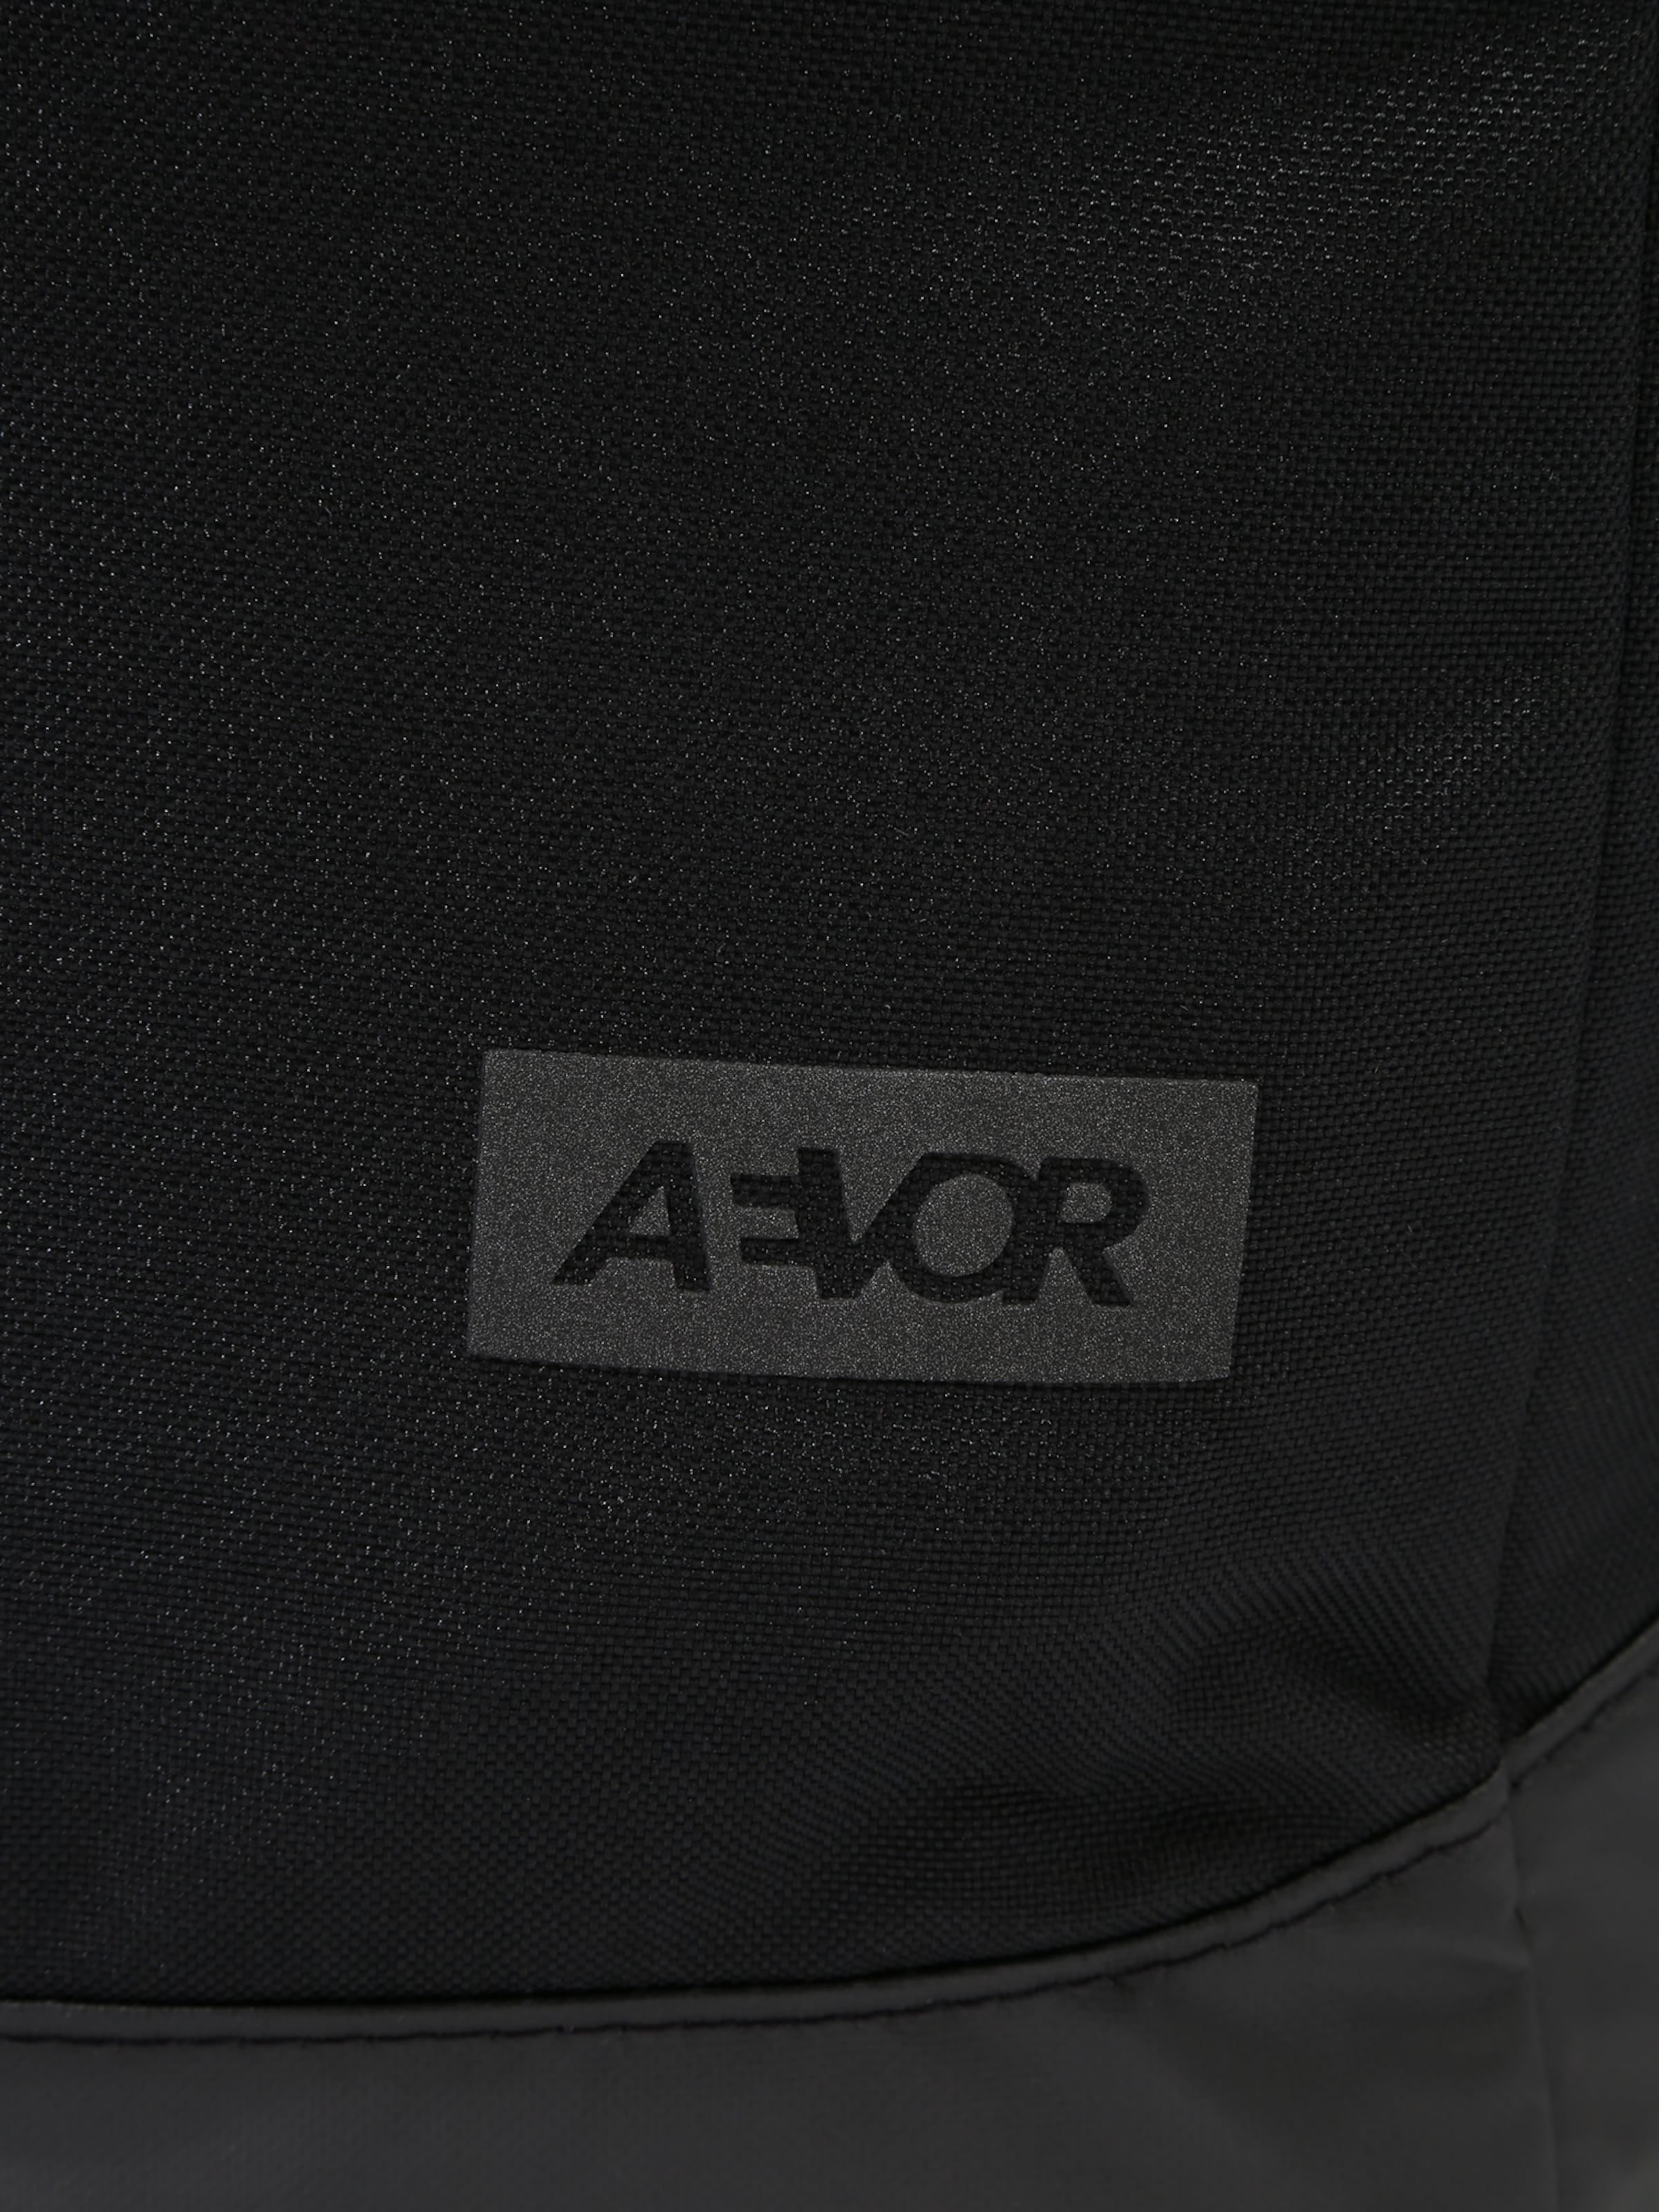 AEVOR AEVOR Rucksack 'AEVOR' Rucksack PqwpxaO